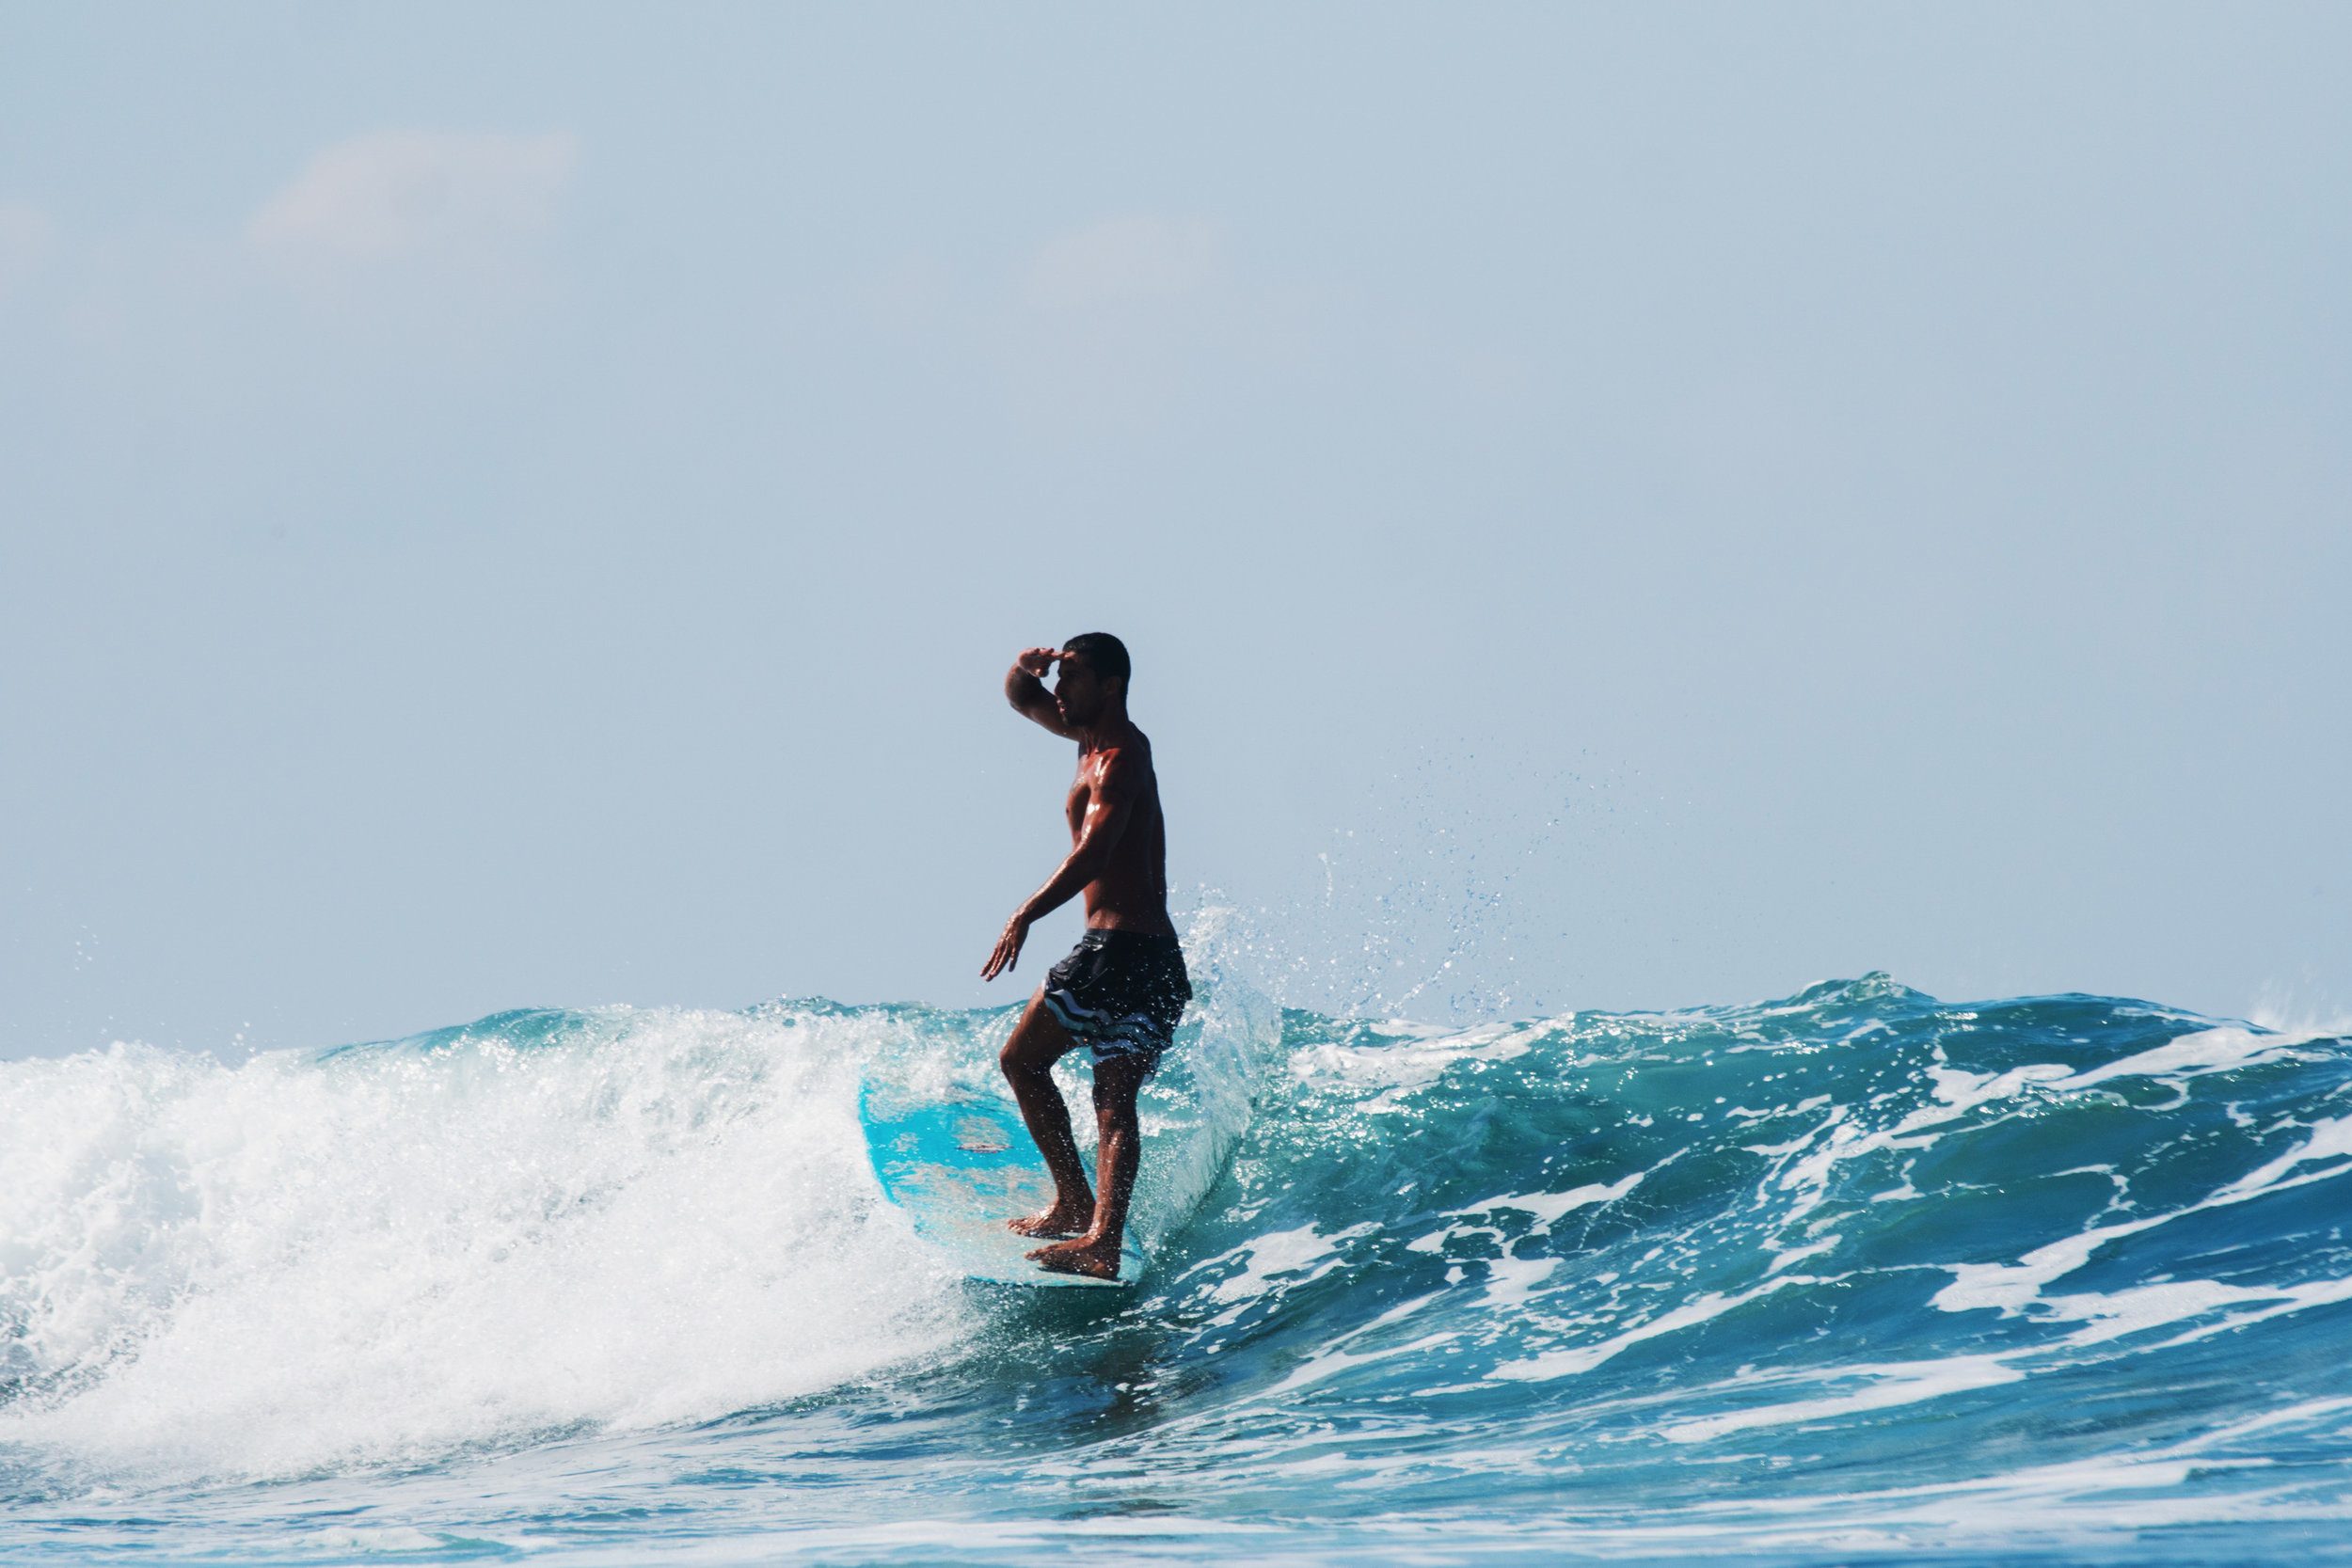 Surf-Mexico-Zihuatanejo-Sayulita-Ixtapa-Zihuatanejo-Diego-Cadena-Olas-Fotografia-Heiko-Bothe-25.jpg